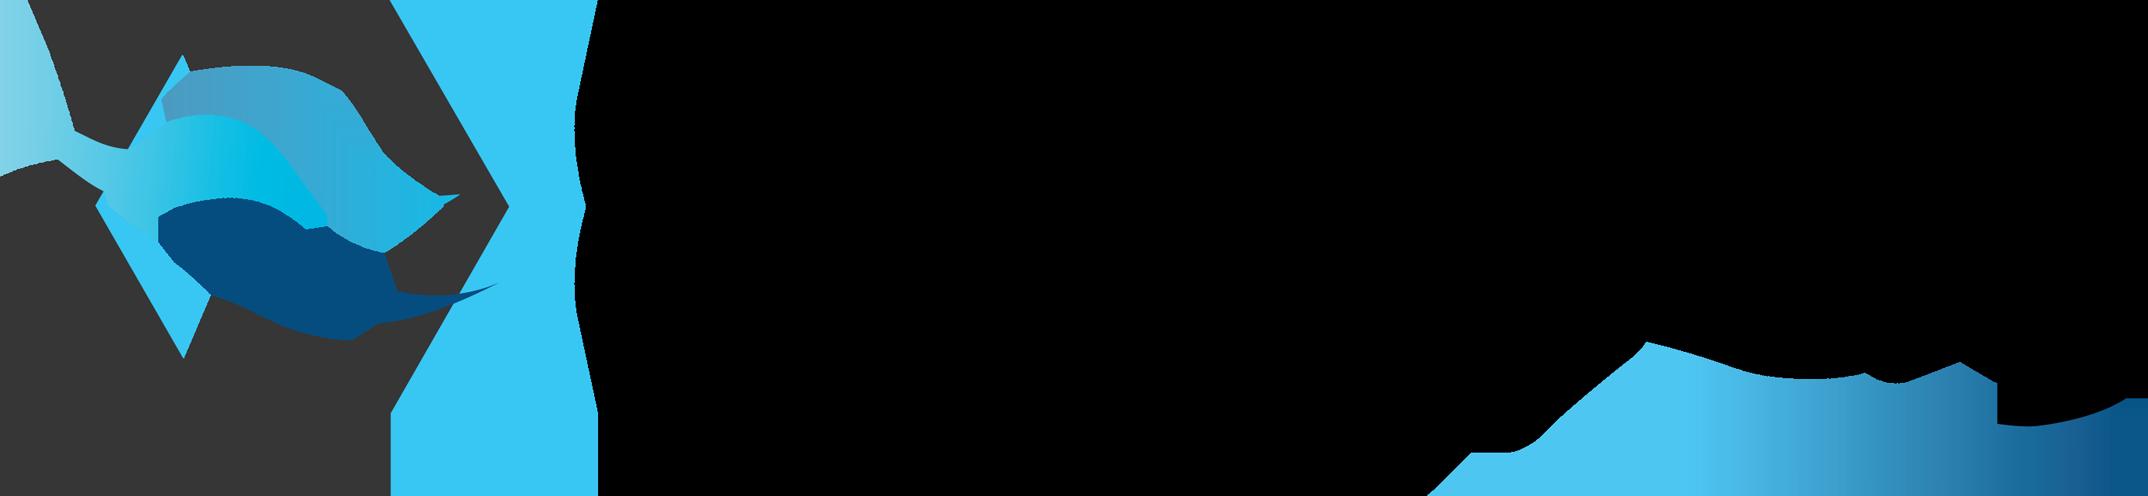 LOGO-CHILLPAY-WATERMARK